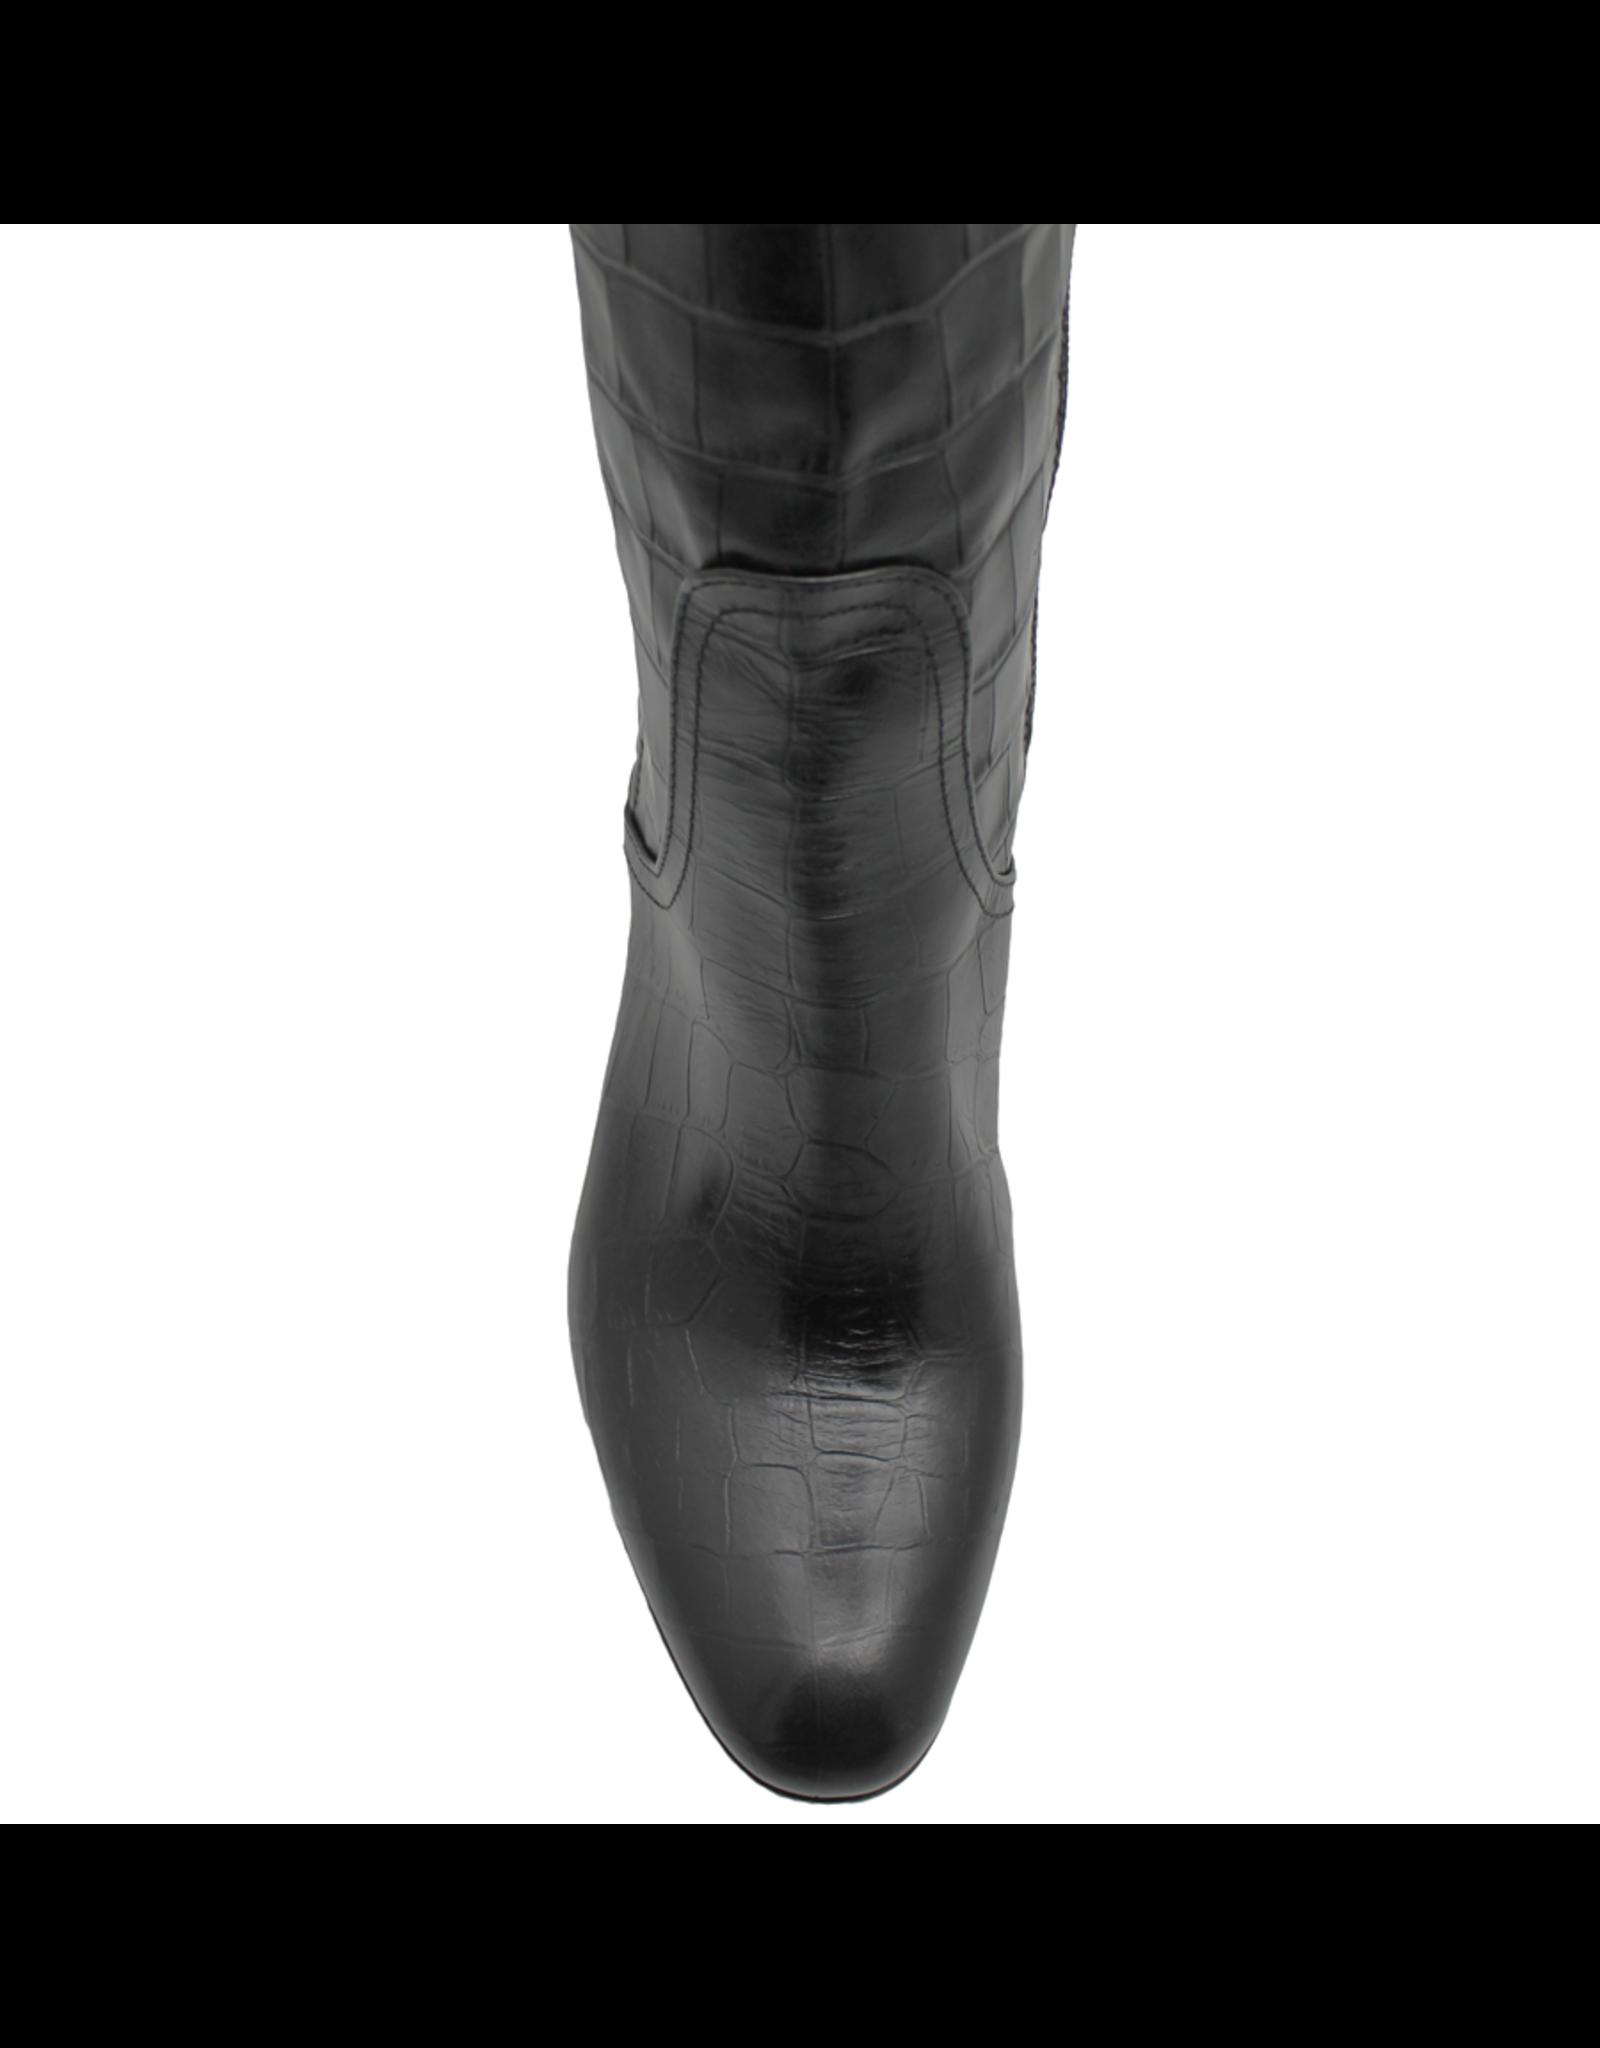 Strategia Strategia Black Croco Over The Knee Boot 4600